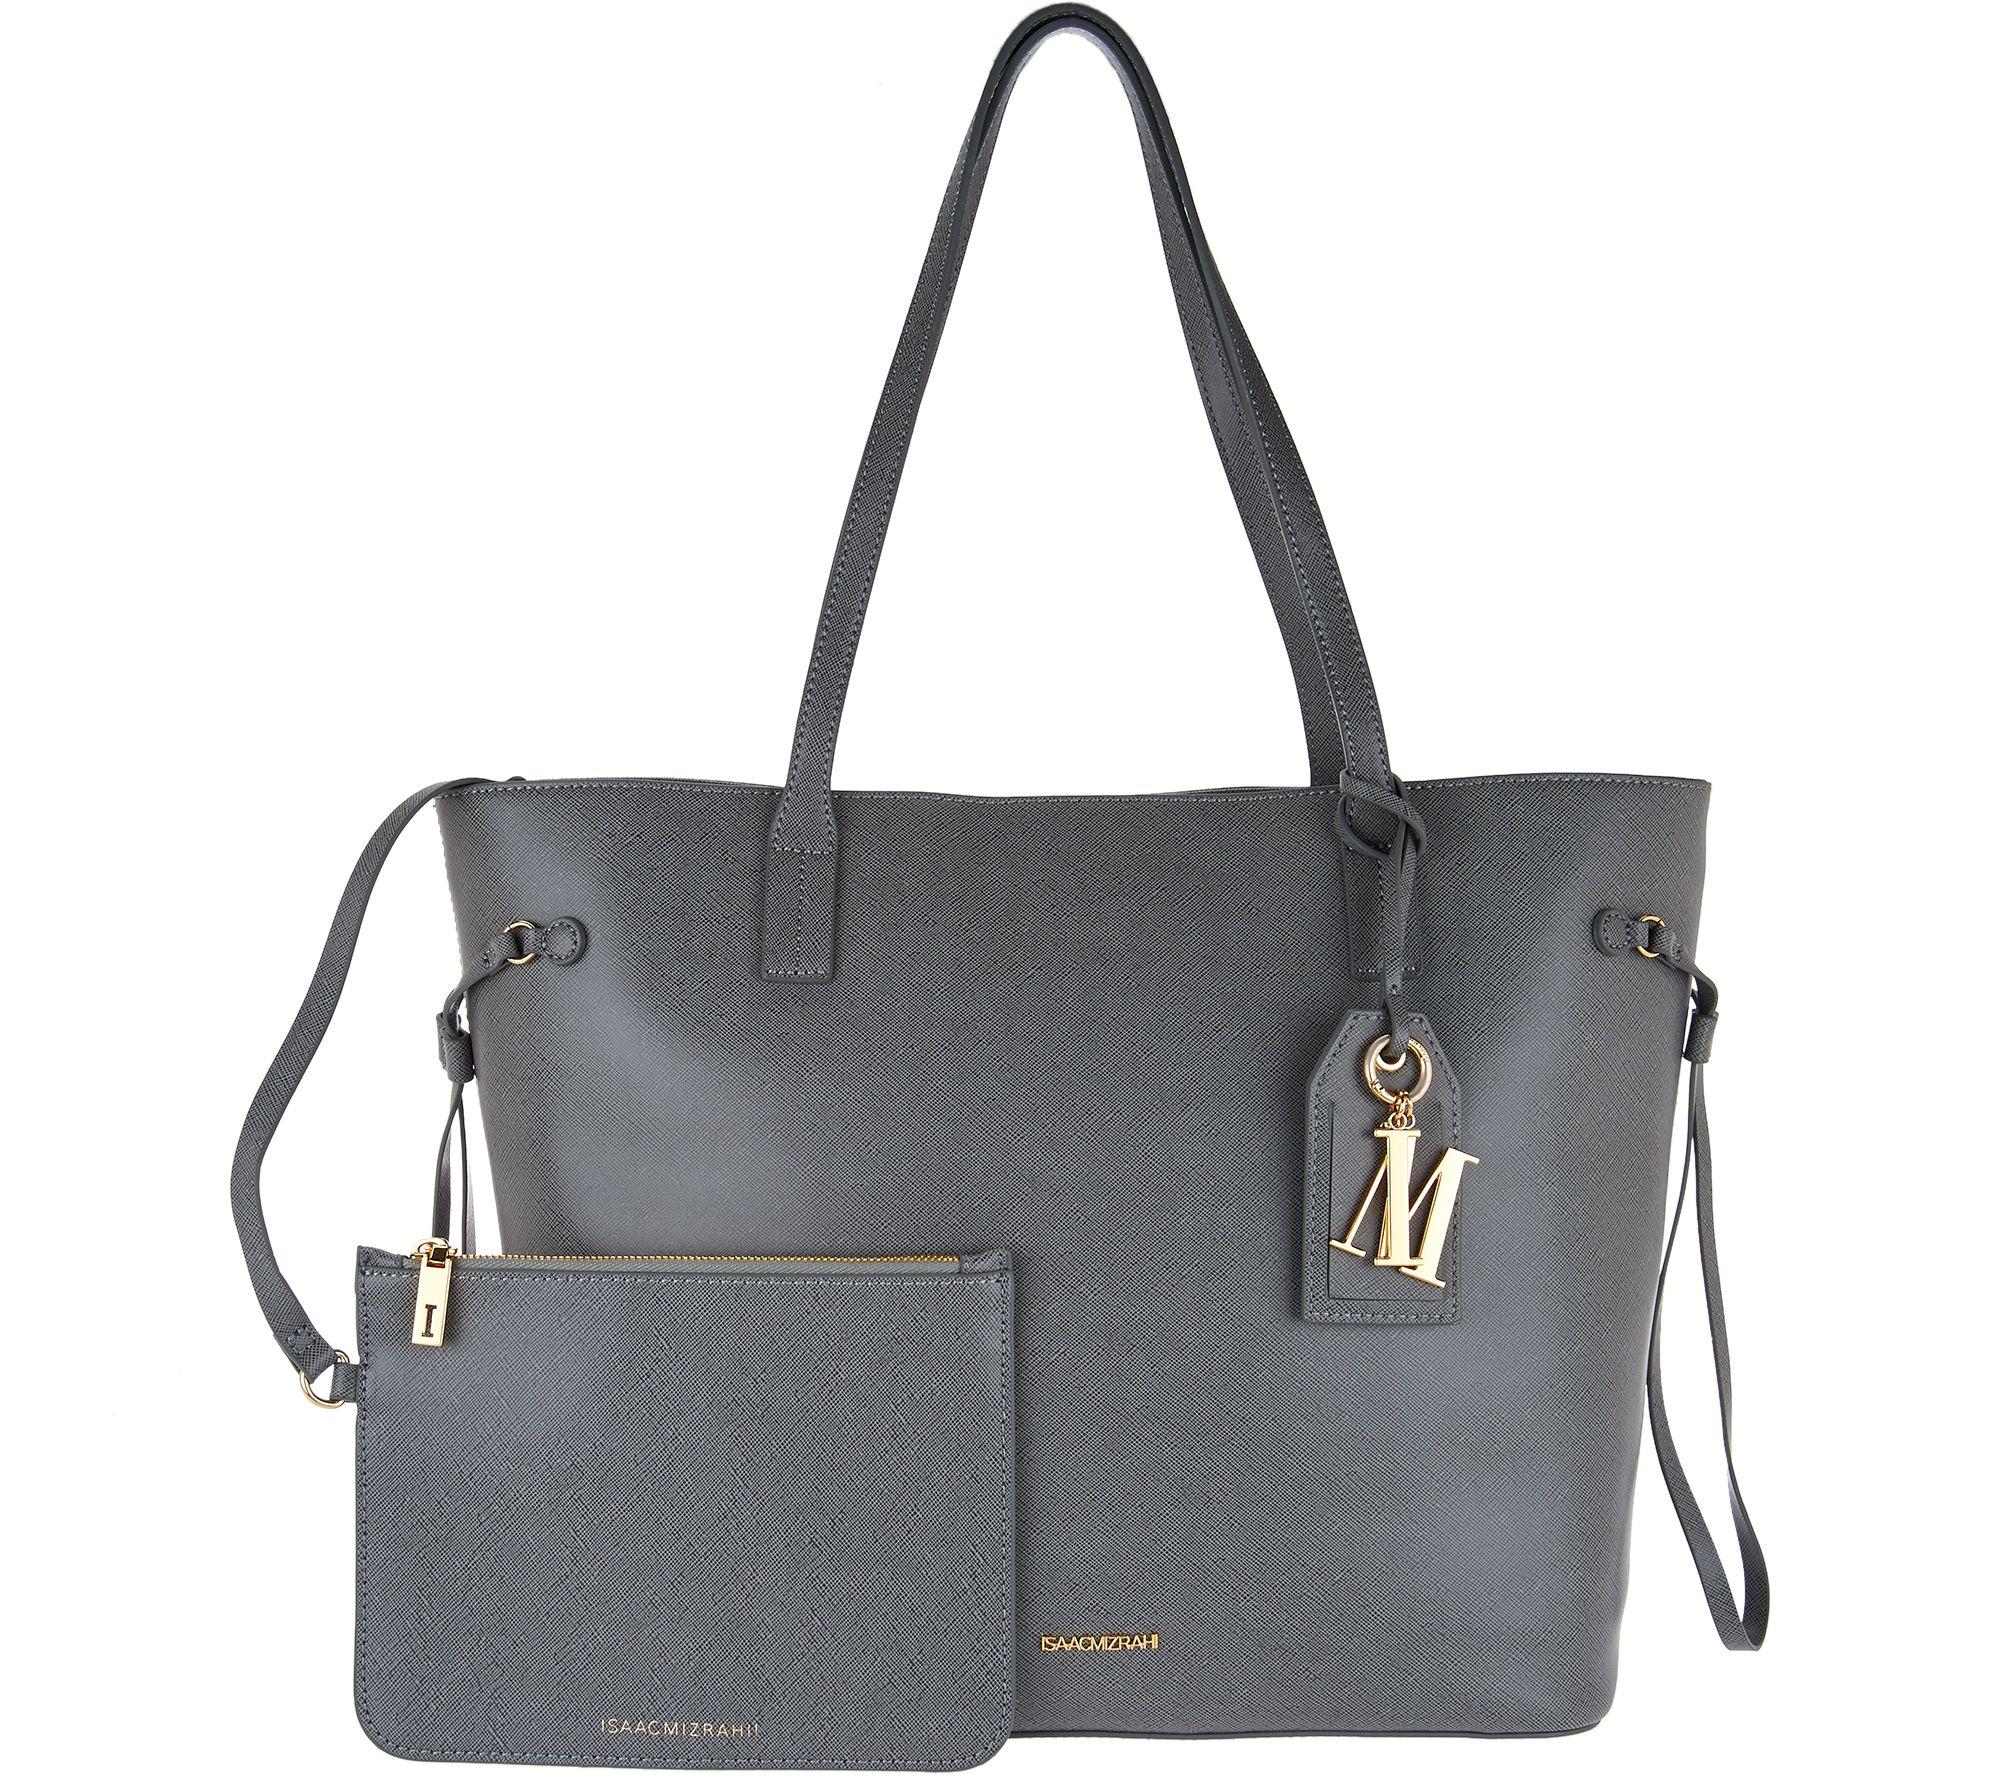 Tote Bags — QVC.com